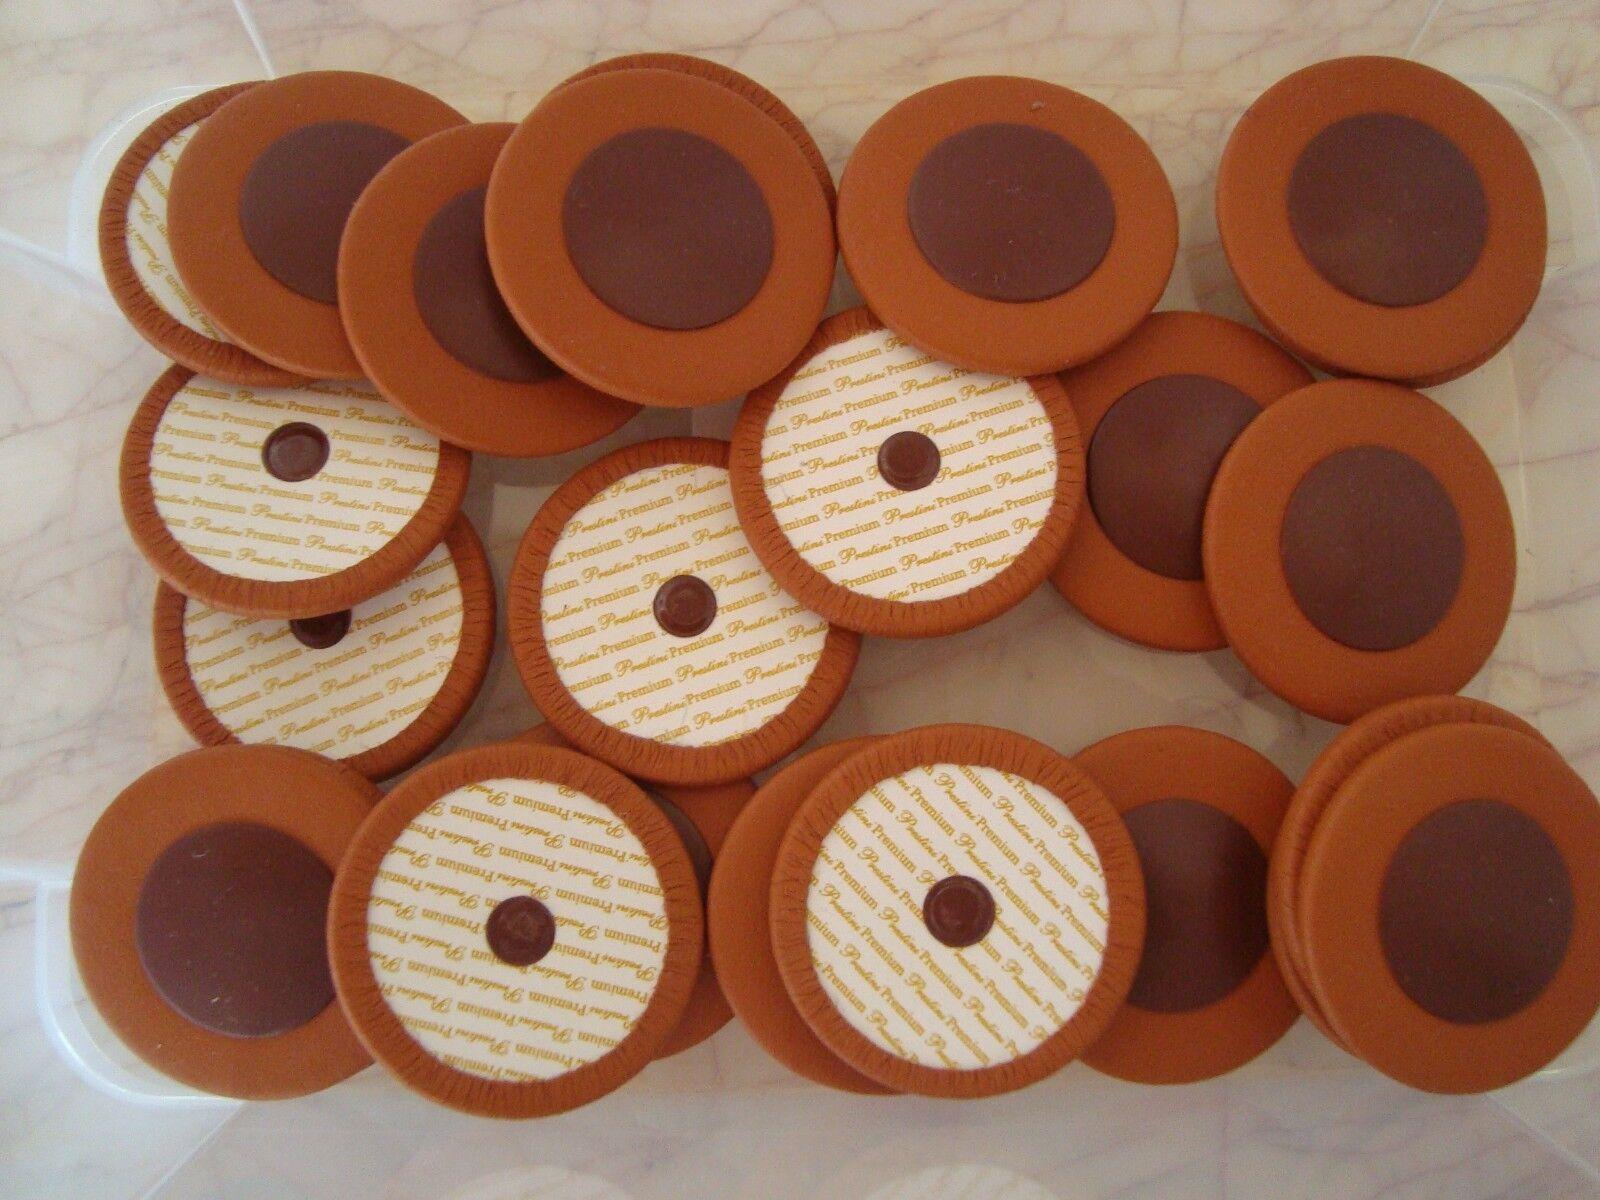 Prestini Sax almohadillas Talla 34.5 mm-Lote De 50 50 50  punto de venta de la marca